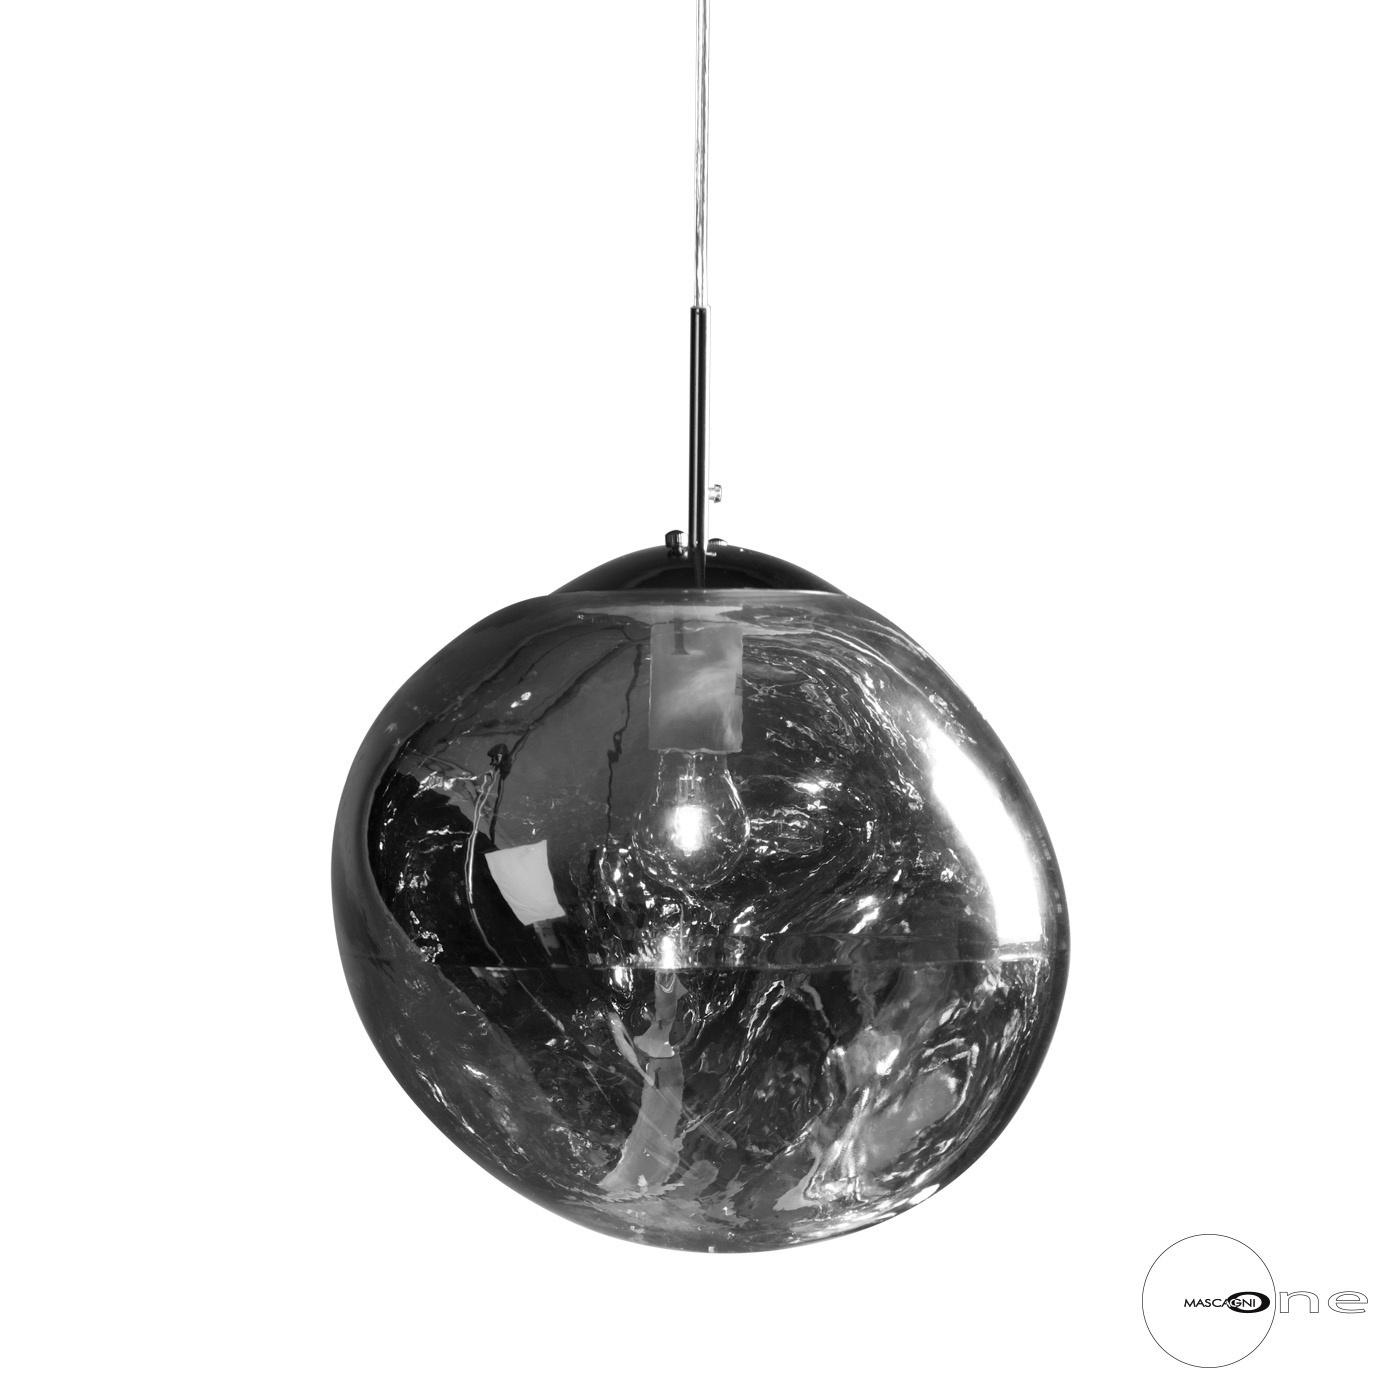 Art Mascagni O1491 CEILING LAMP DIAM.36 - COL.CHROME